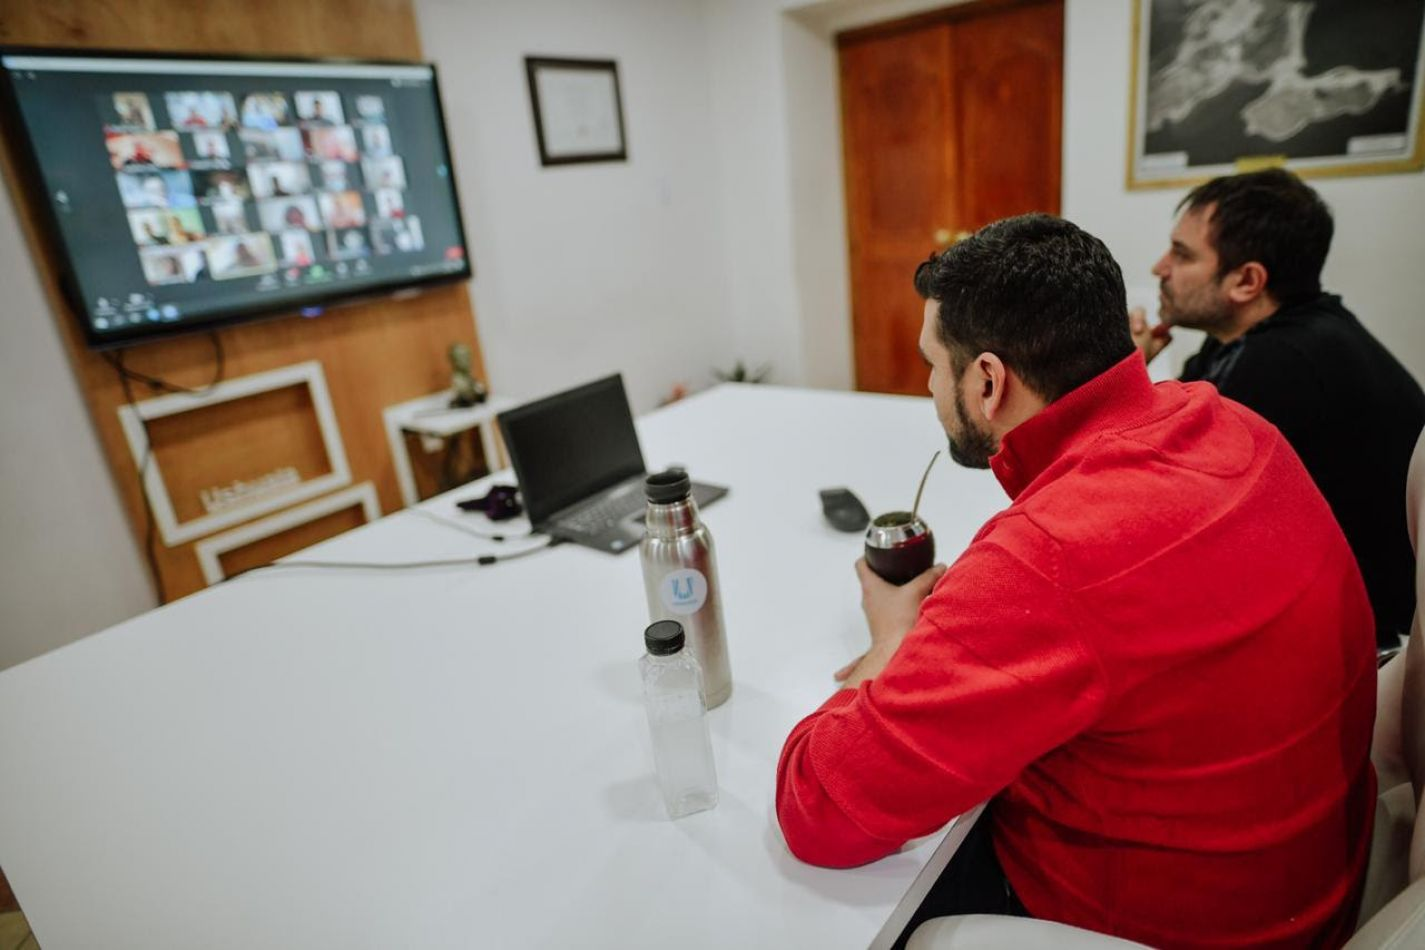 Vuoto se reunió con profesores del Instituto Municipal de Deportes